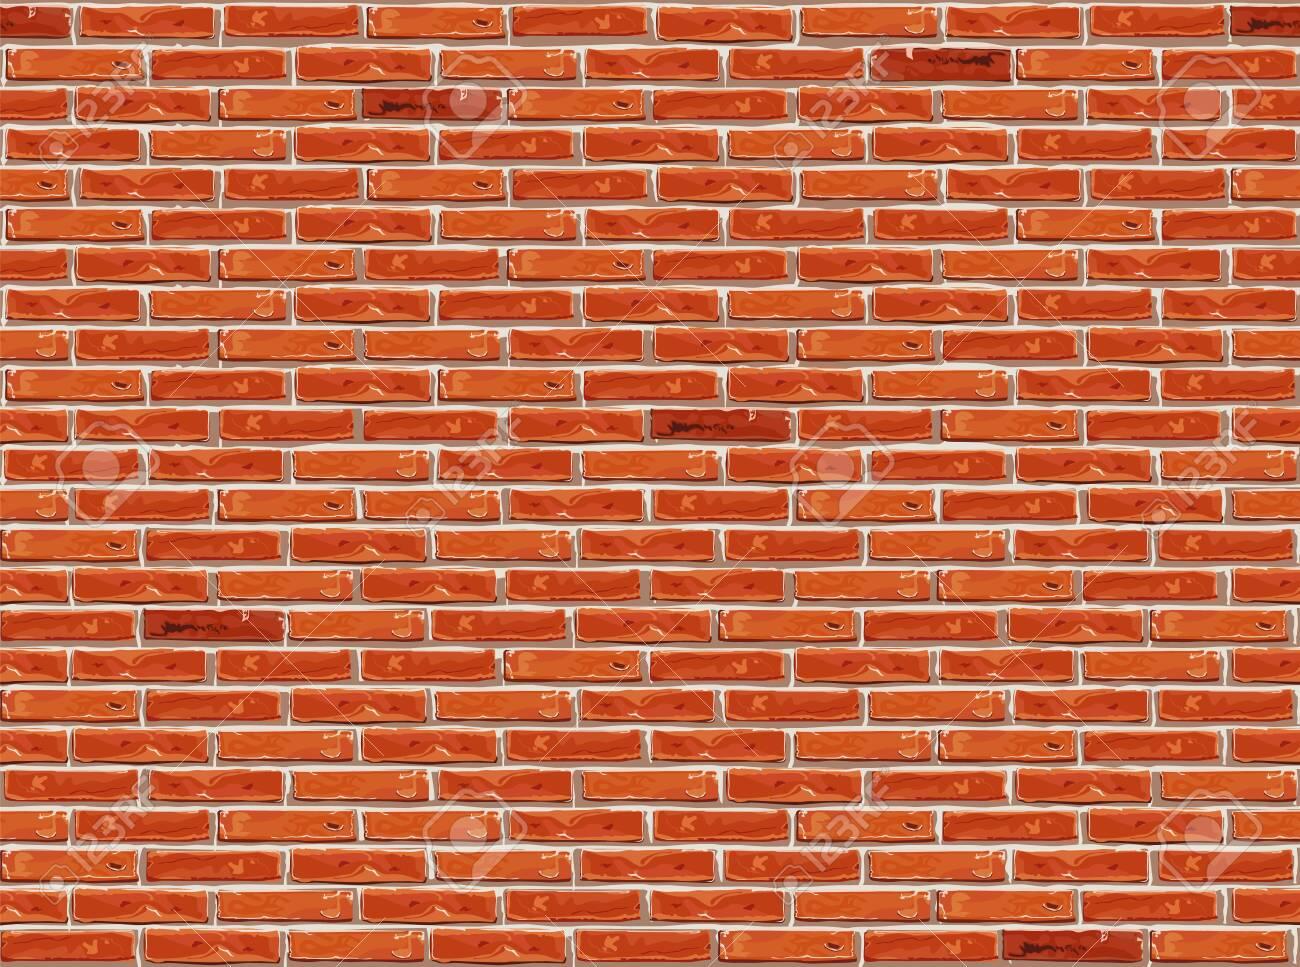 Red brick wall pattern seamless background. - 146967983